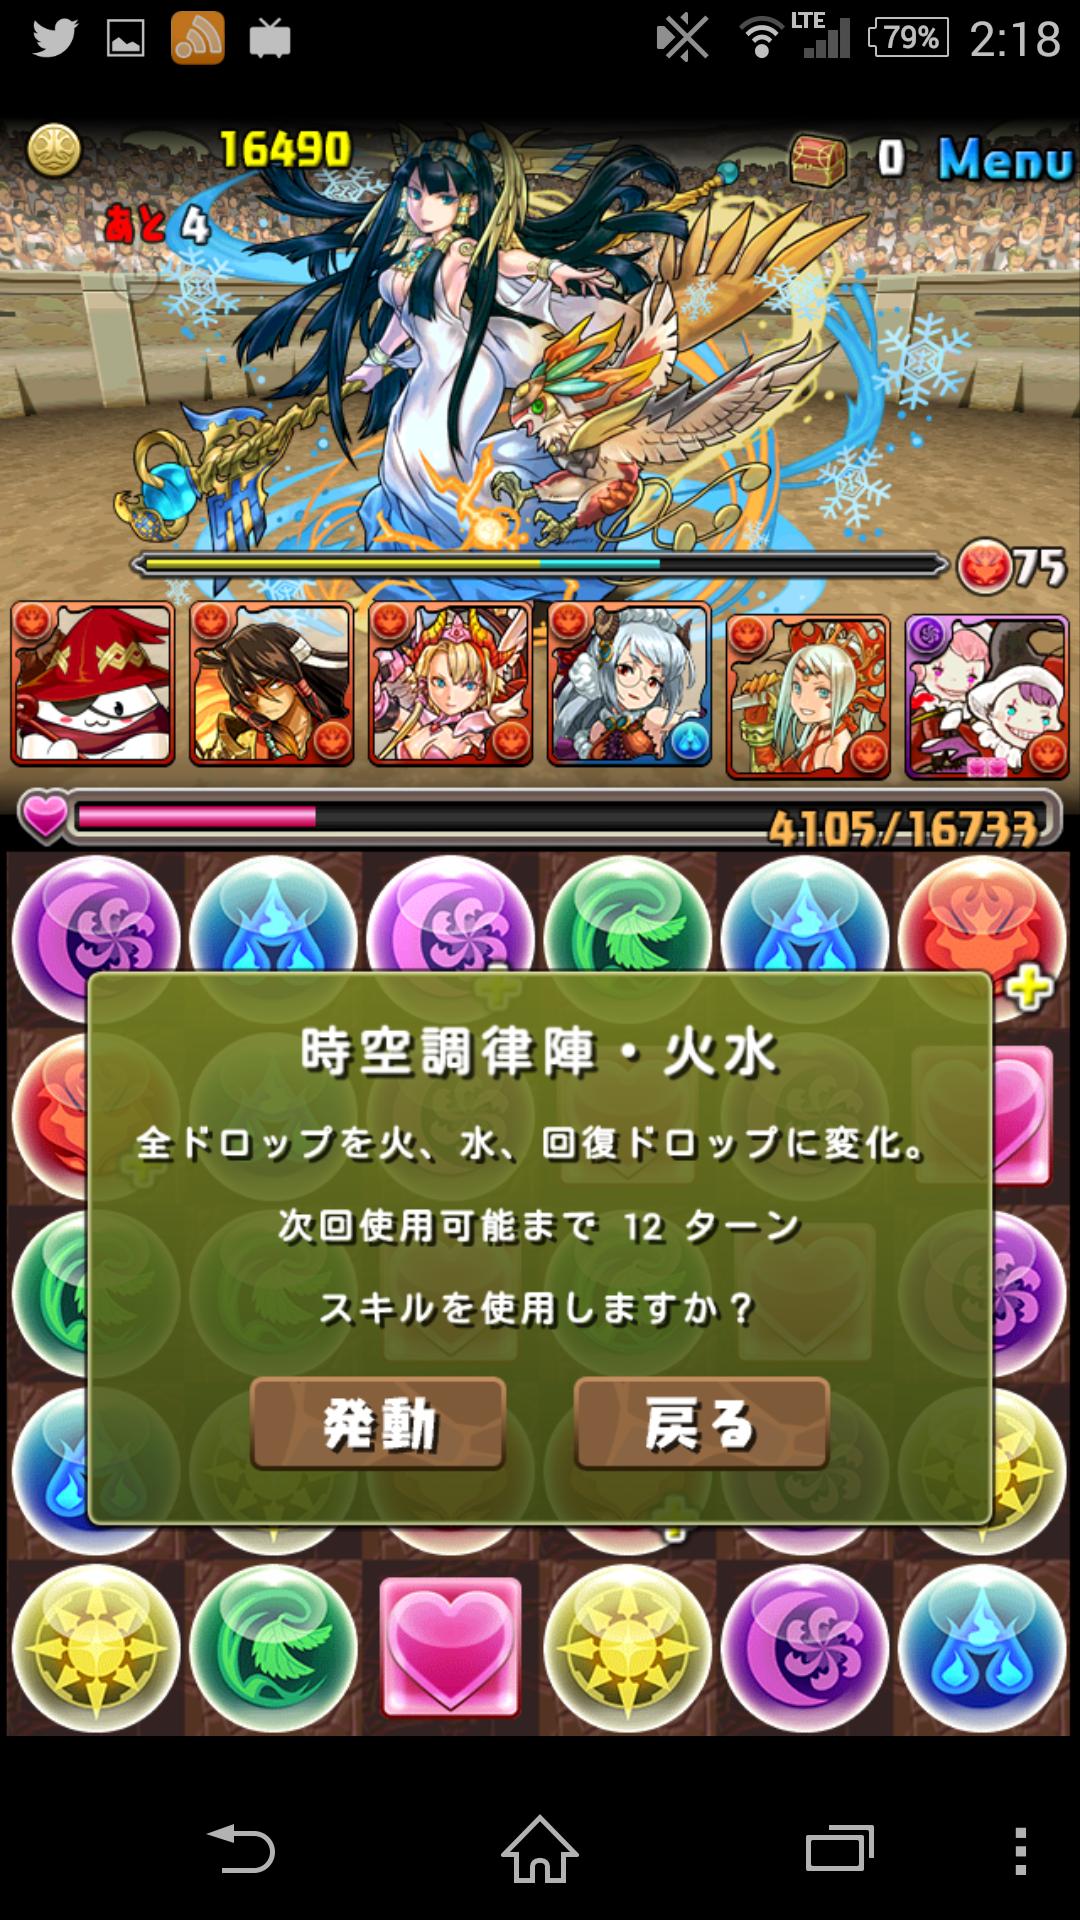 Screenshot_2015-03-12-02-18-42.png